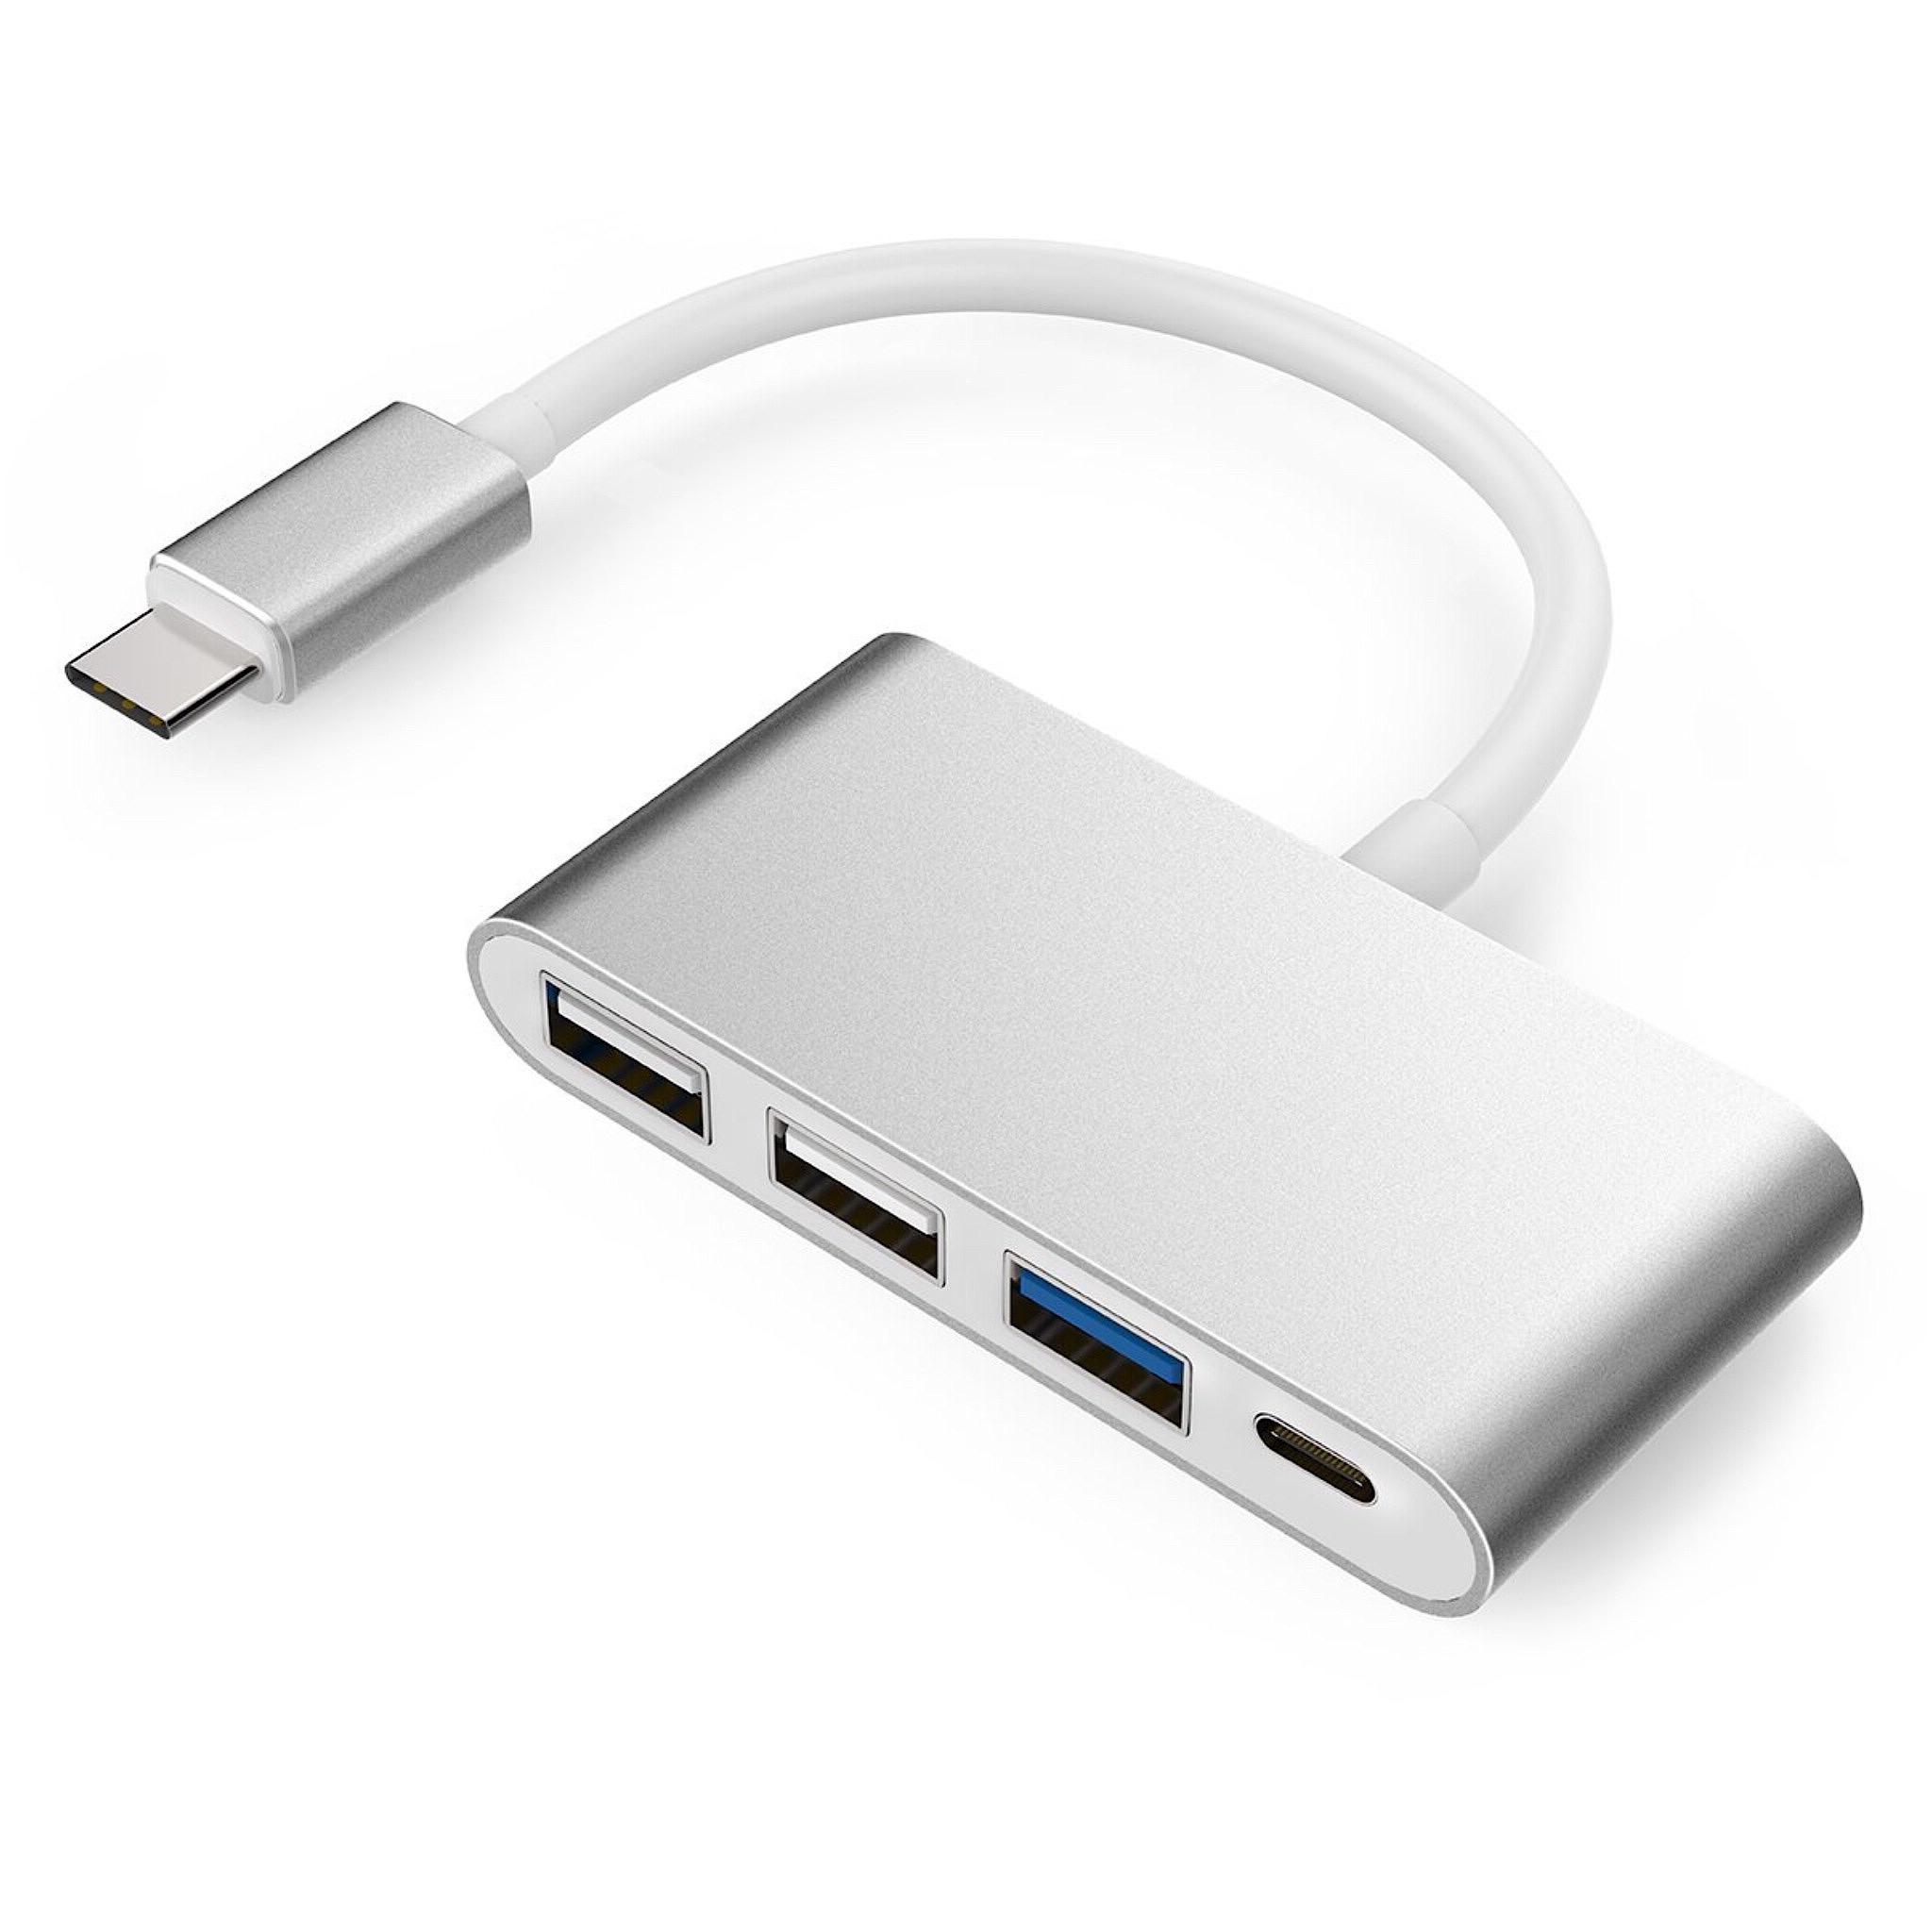 Adaptateur USB-C vers 1 x USB 3.0 et 2 x USB 2.0 + Charge USB-C